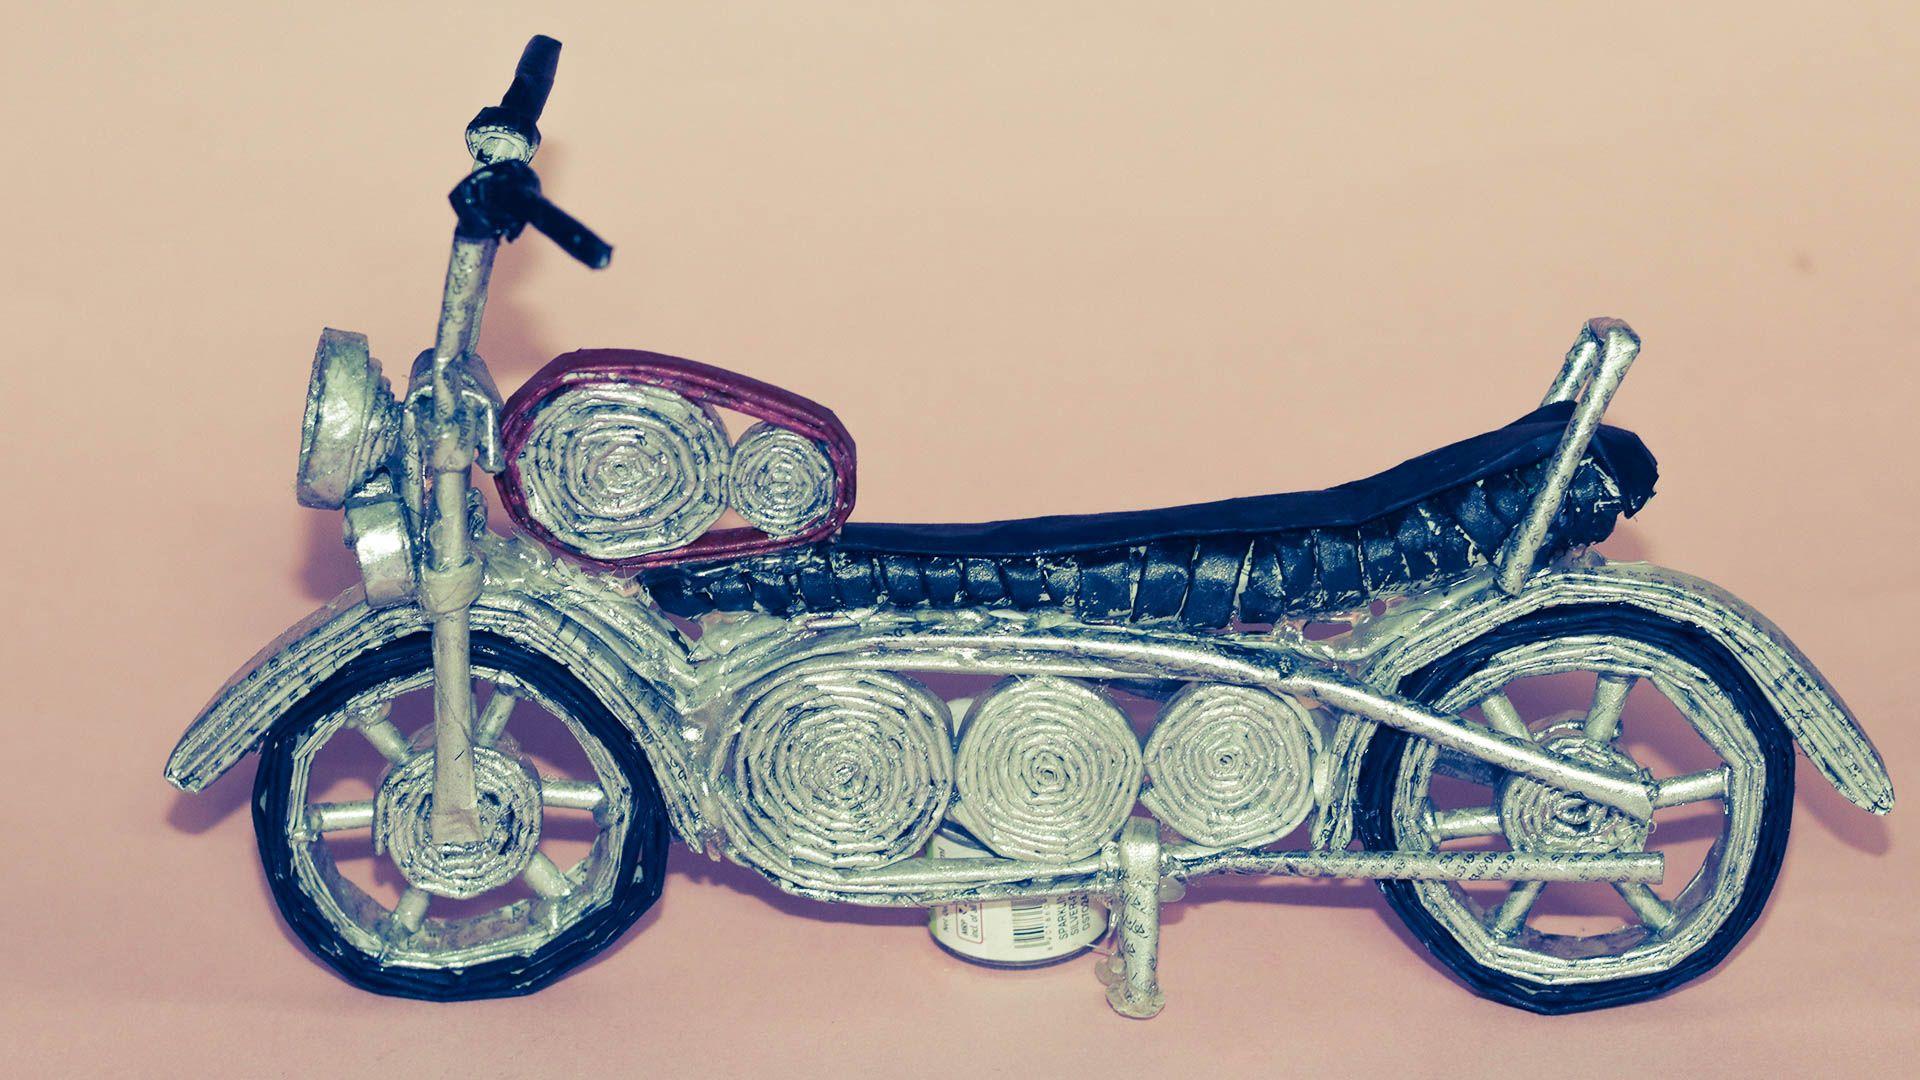 How To Make Handmade Newspaper Bike As A Showpiece Toy Diyroll